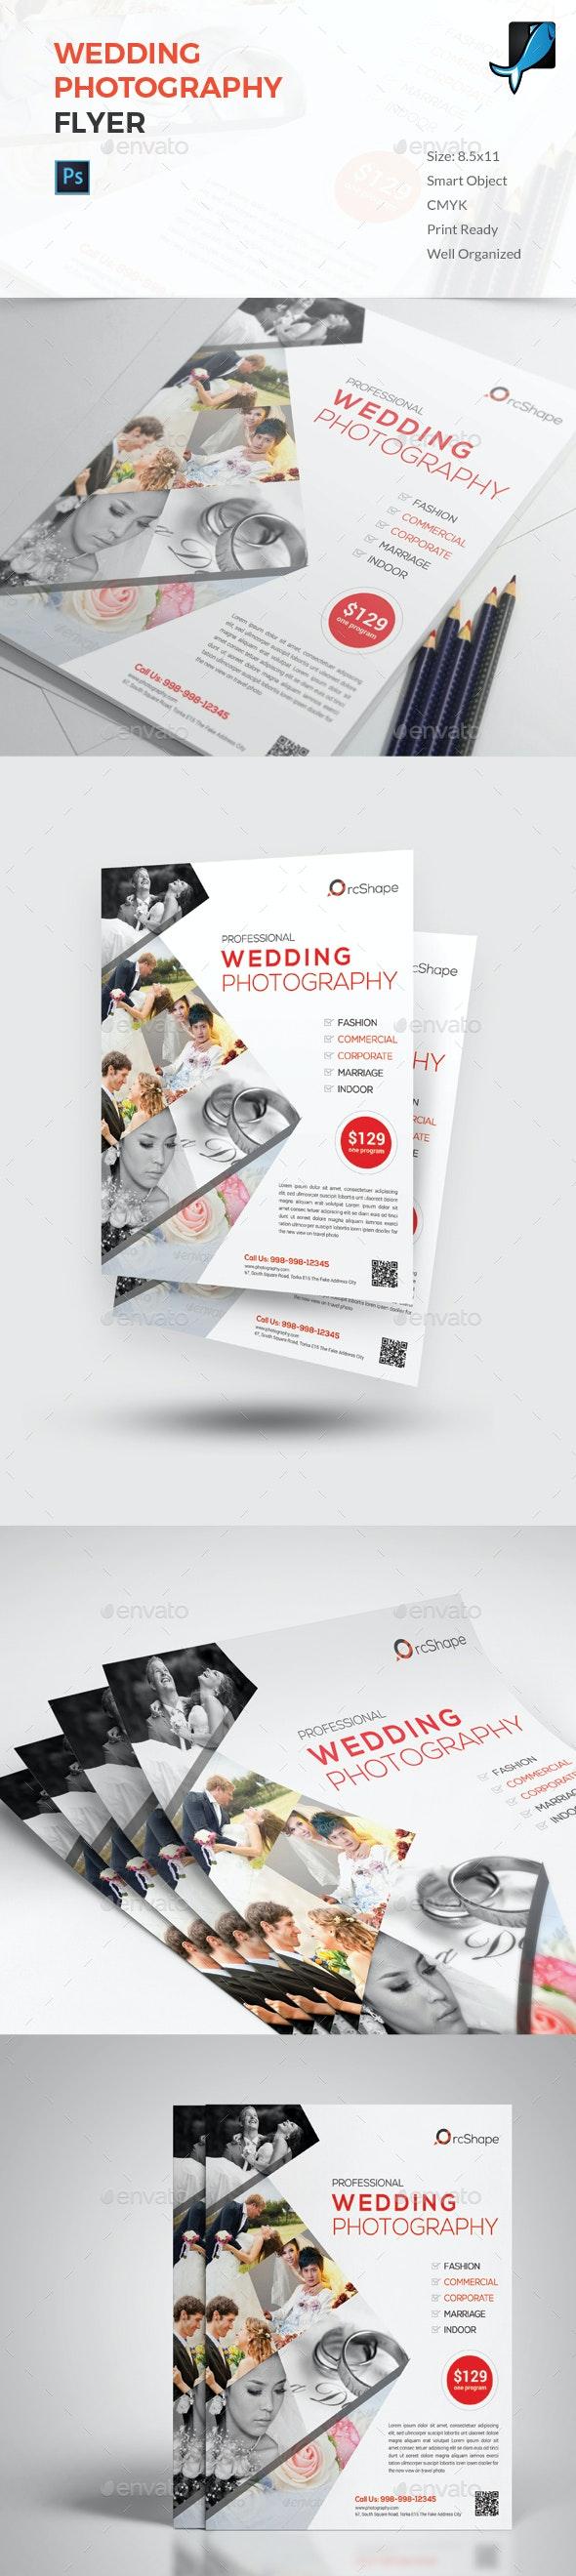 Wedding Photography Flyer - Corporate Flyers